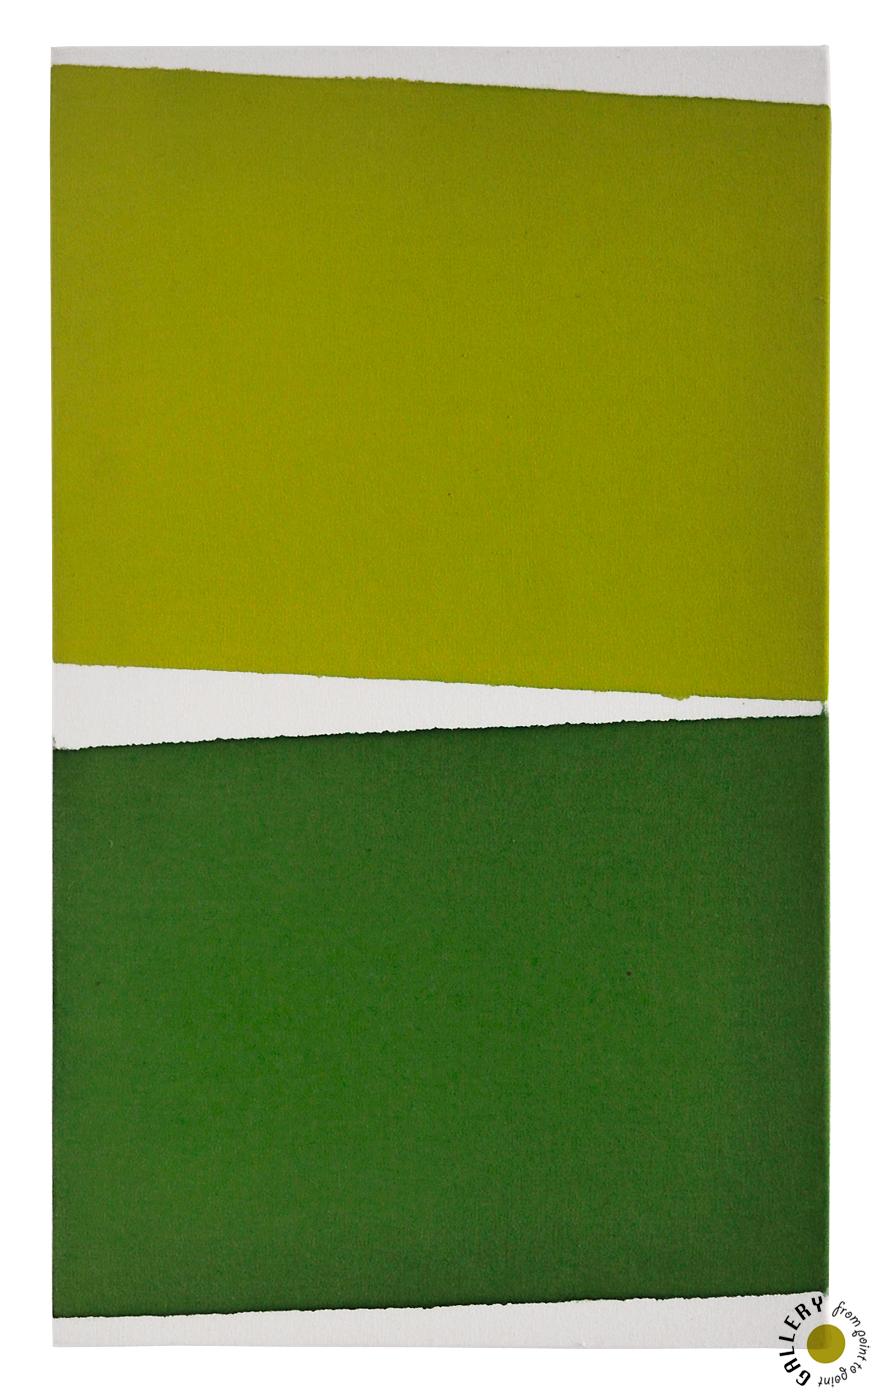 Guillaume-Moschini-Peinture-Vert-vert